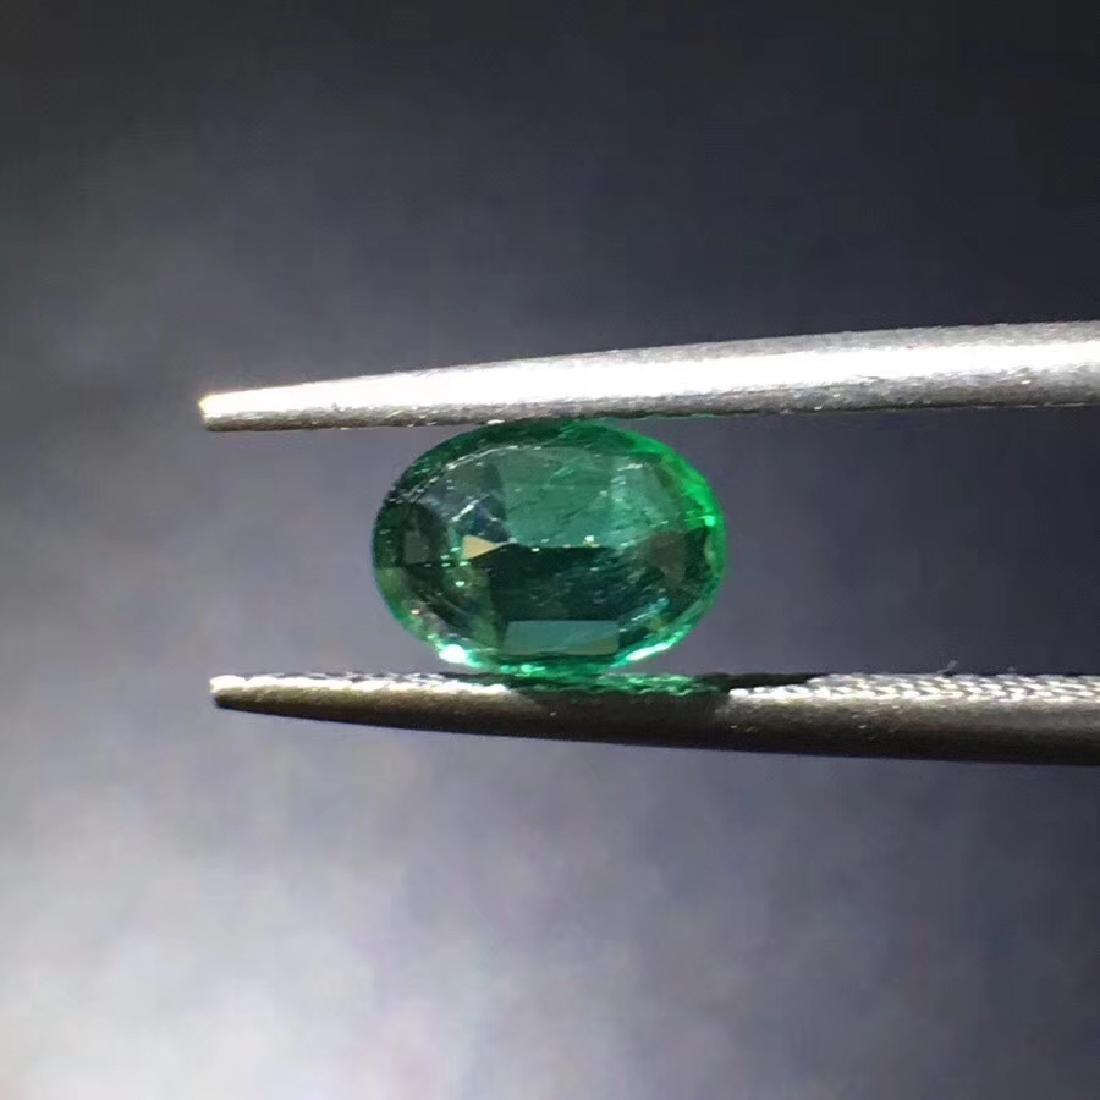 0.94 ct Emerald 5.0*6.9*3.7 mm Oval Cut - 3